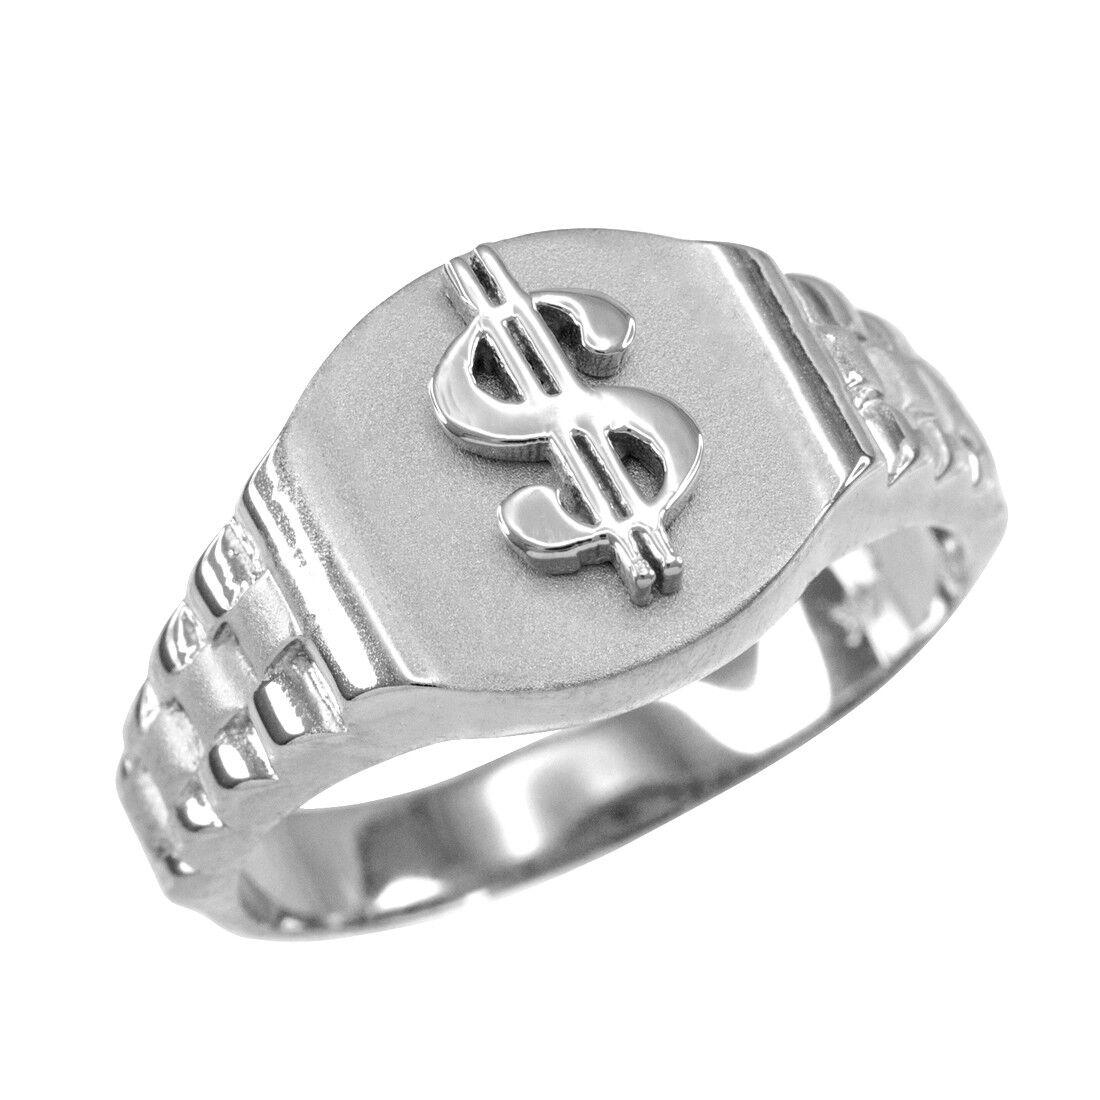 10K White gold Dollar Sign Mens Hip-Hop Ring